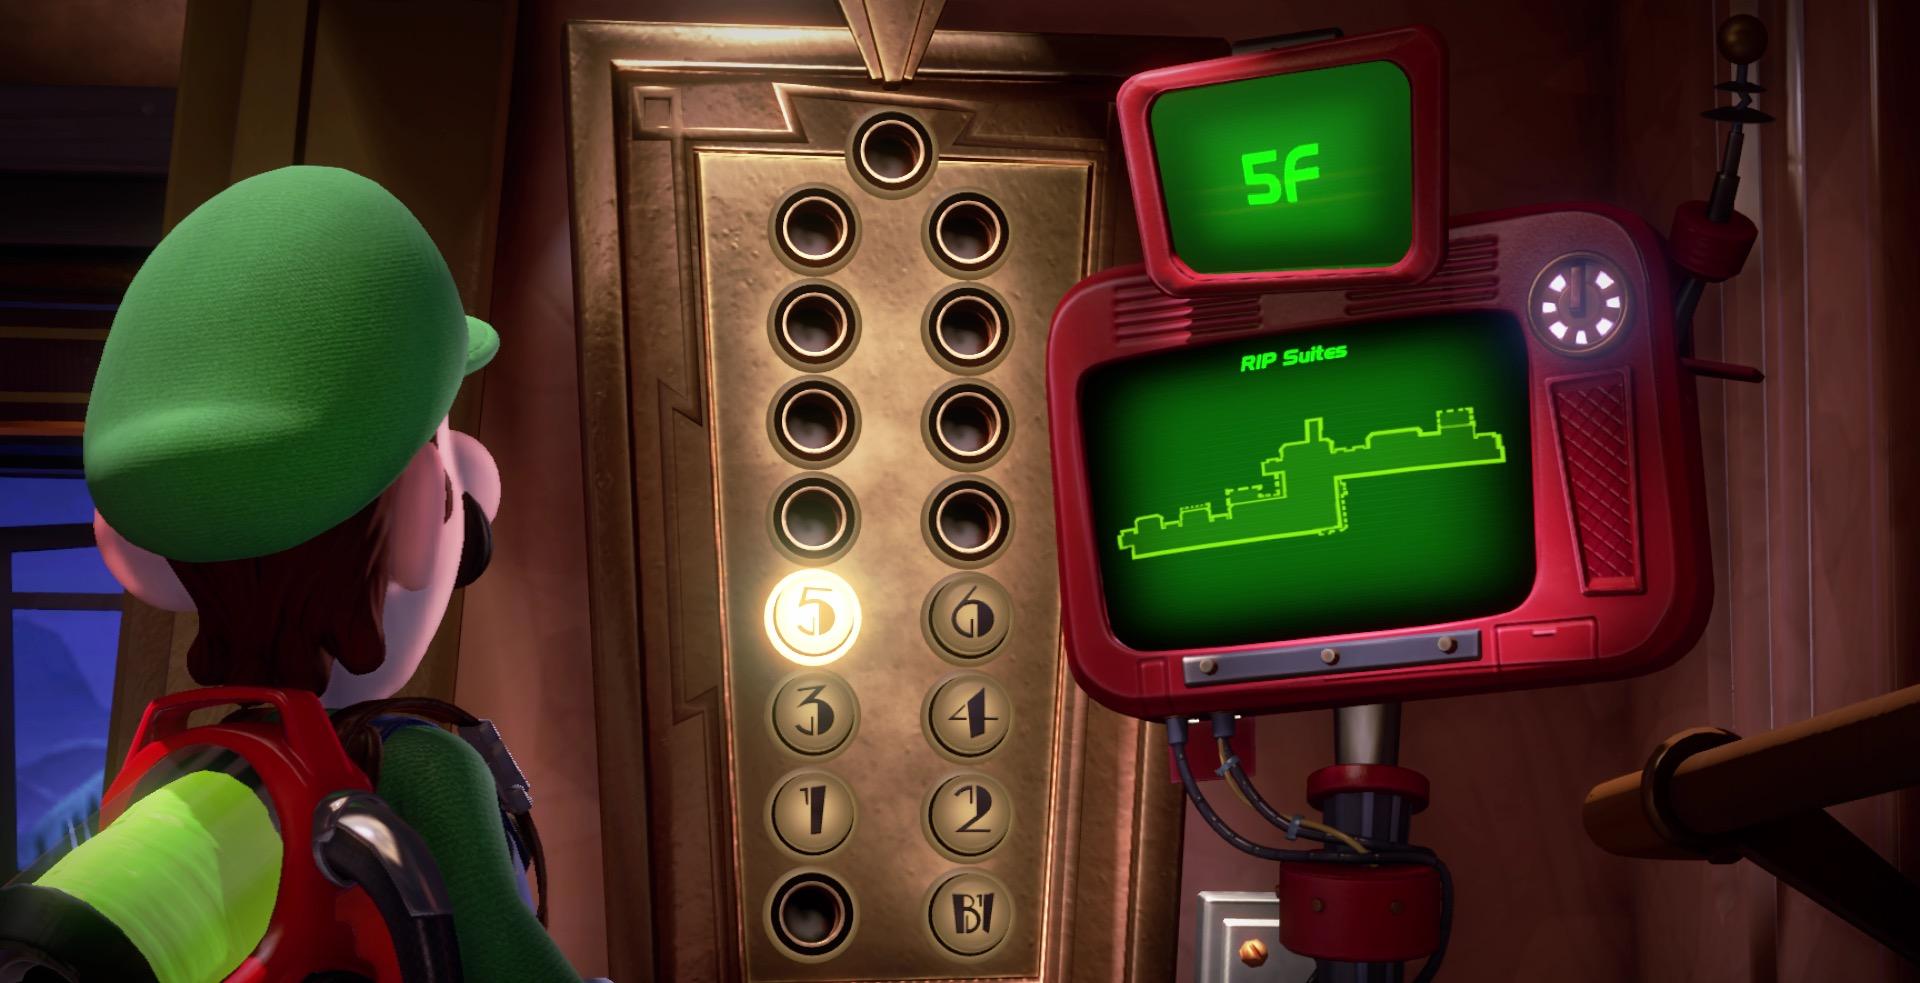 Luigi's Mansion 3 5F gem locations guide